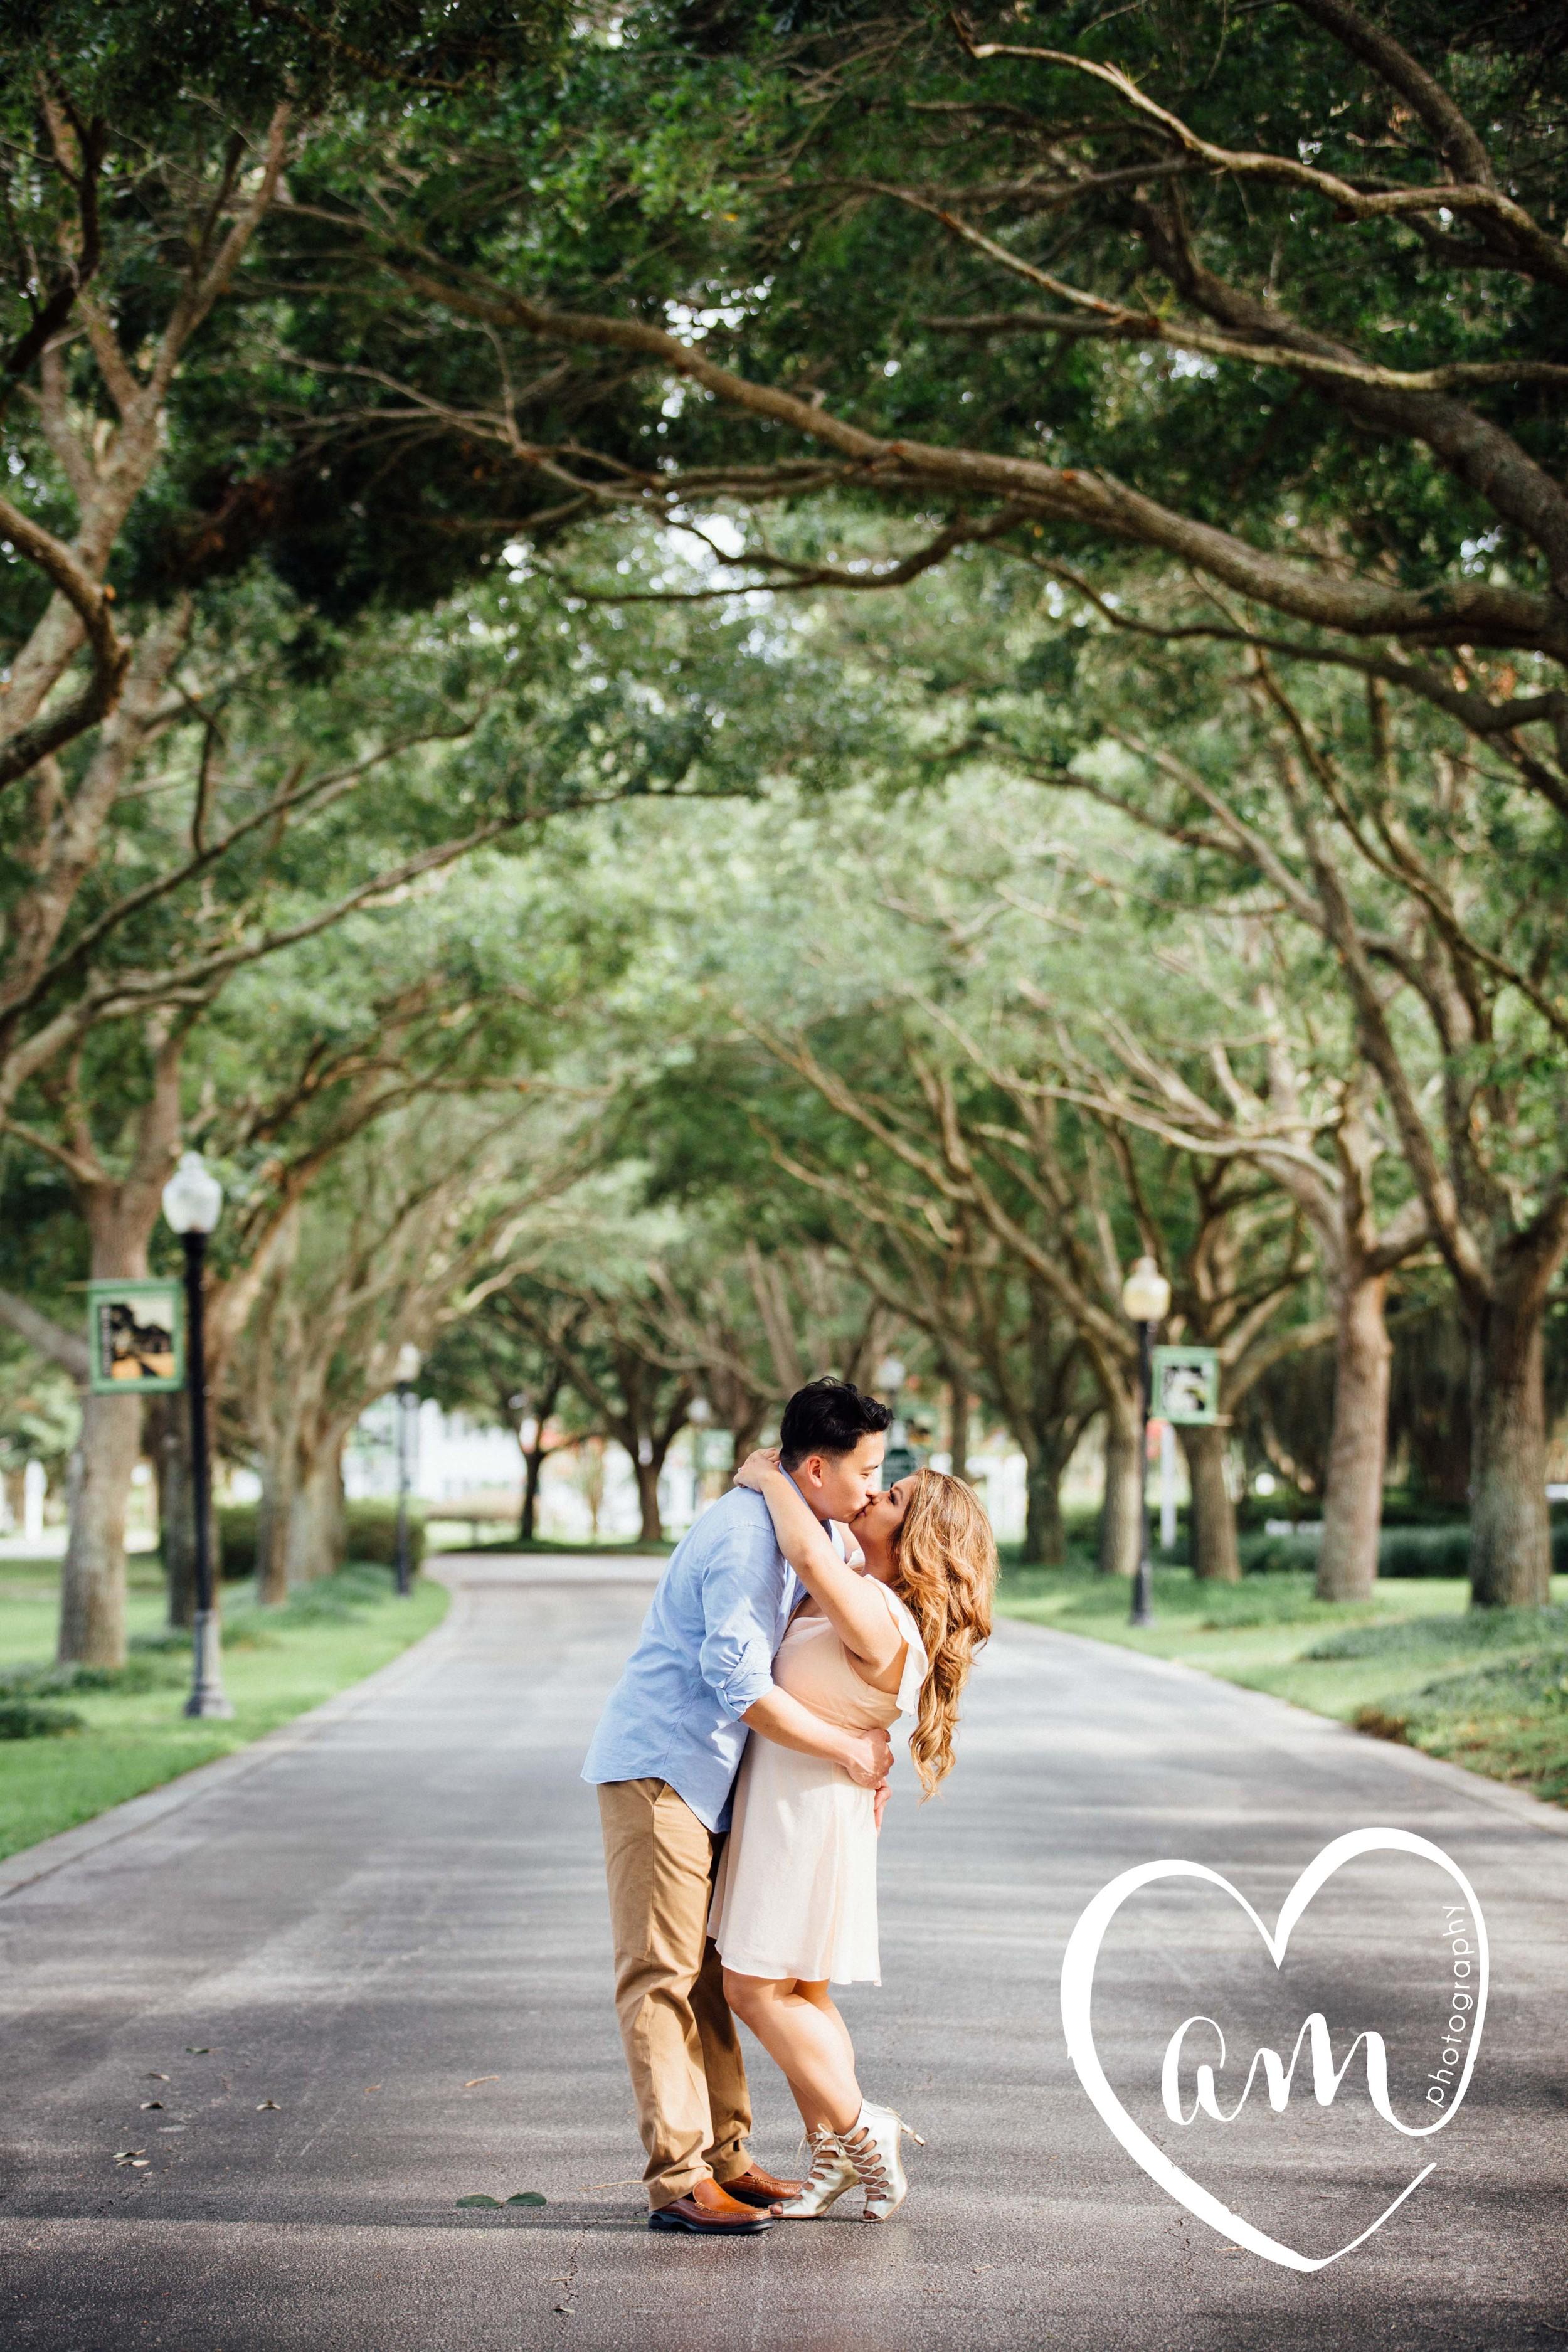 Engagement photos at Cypress Grove Estate House in Orlando, Florida.